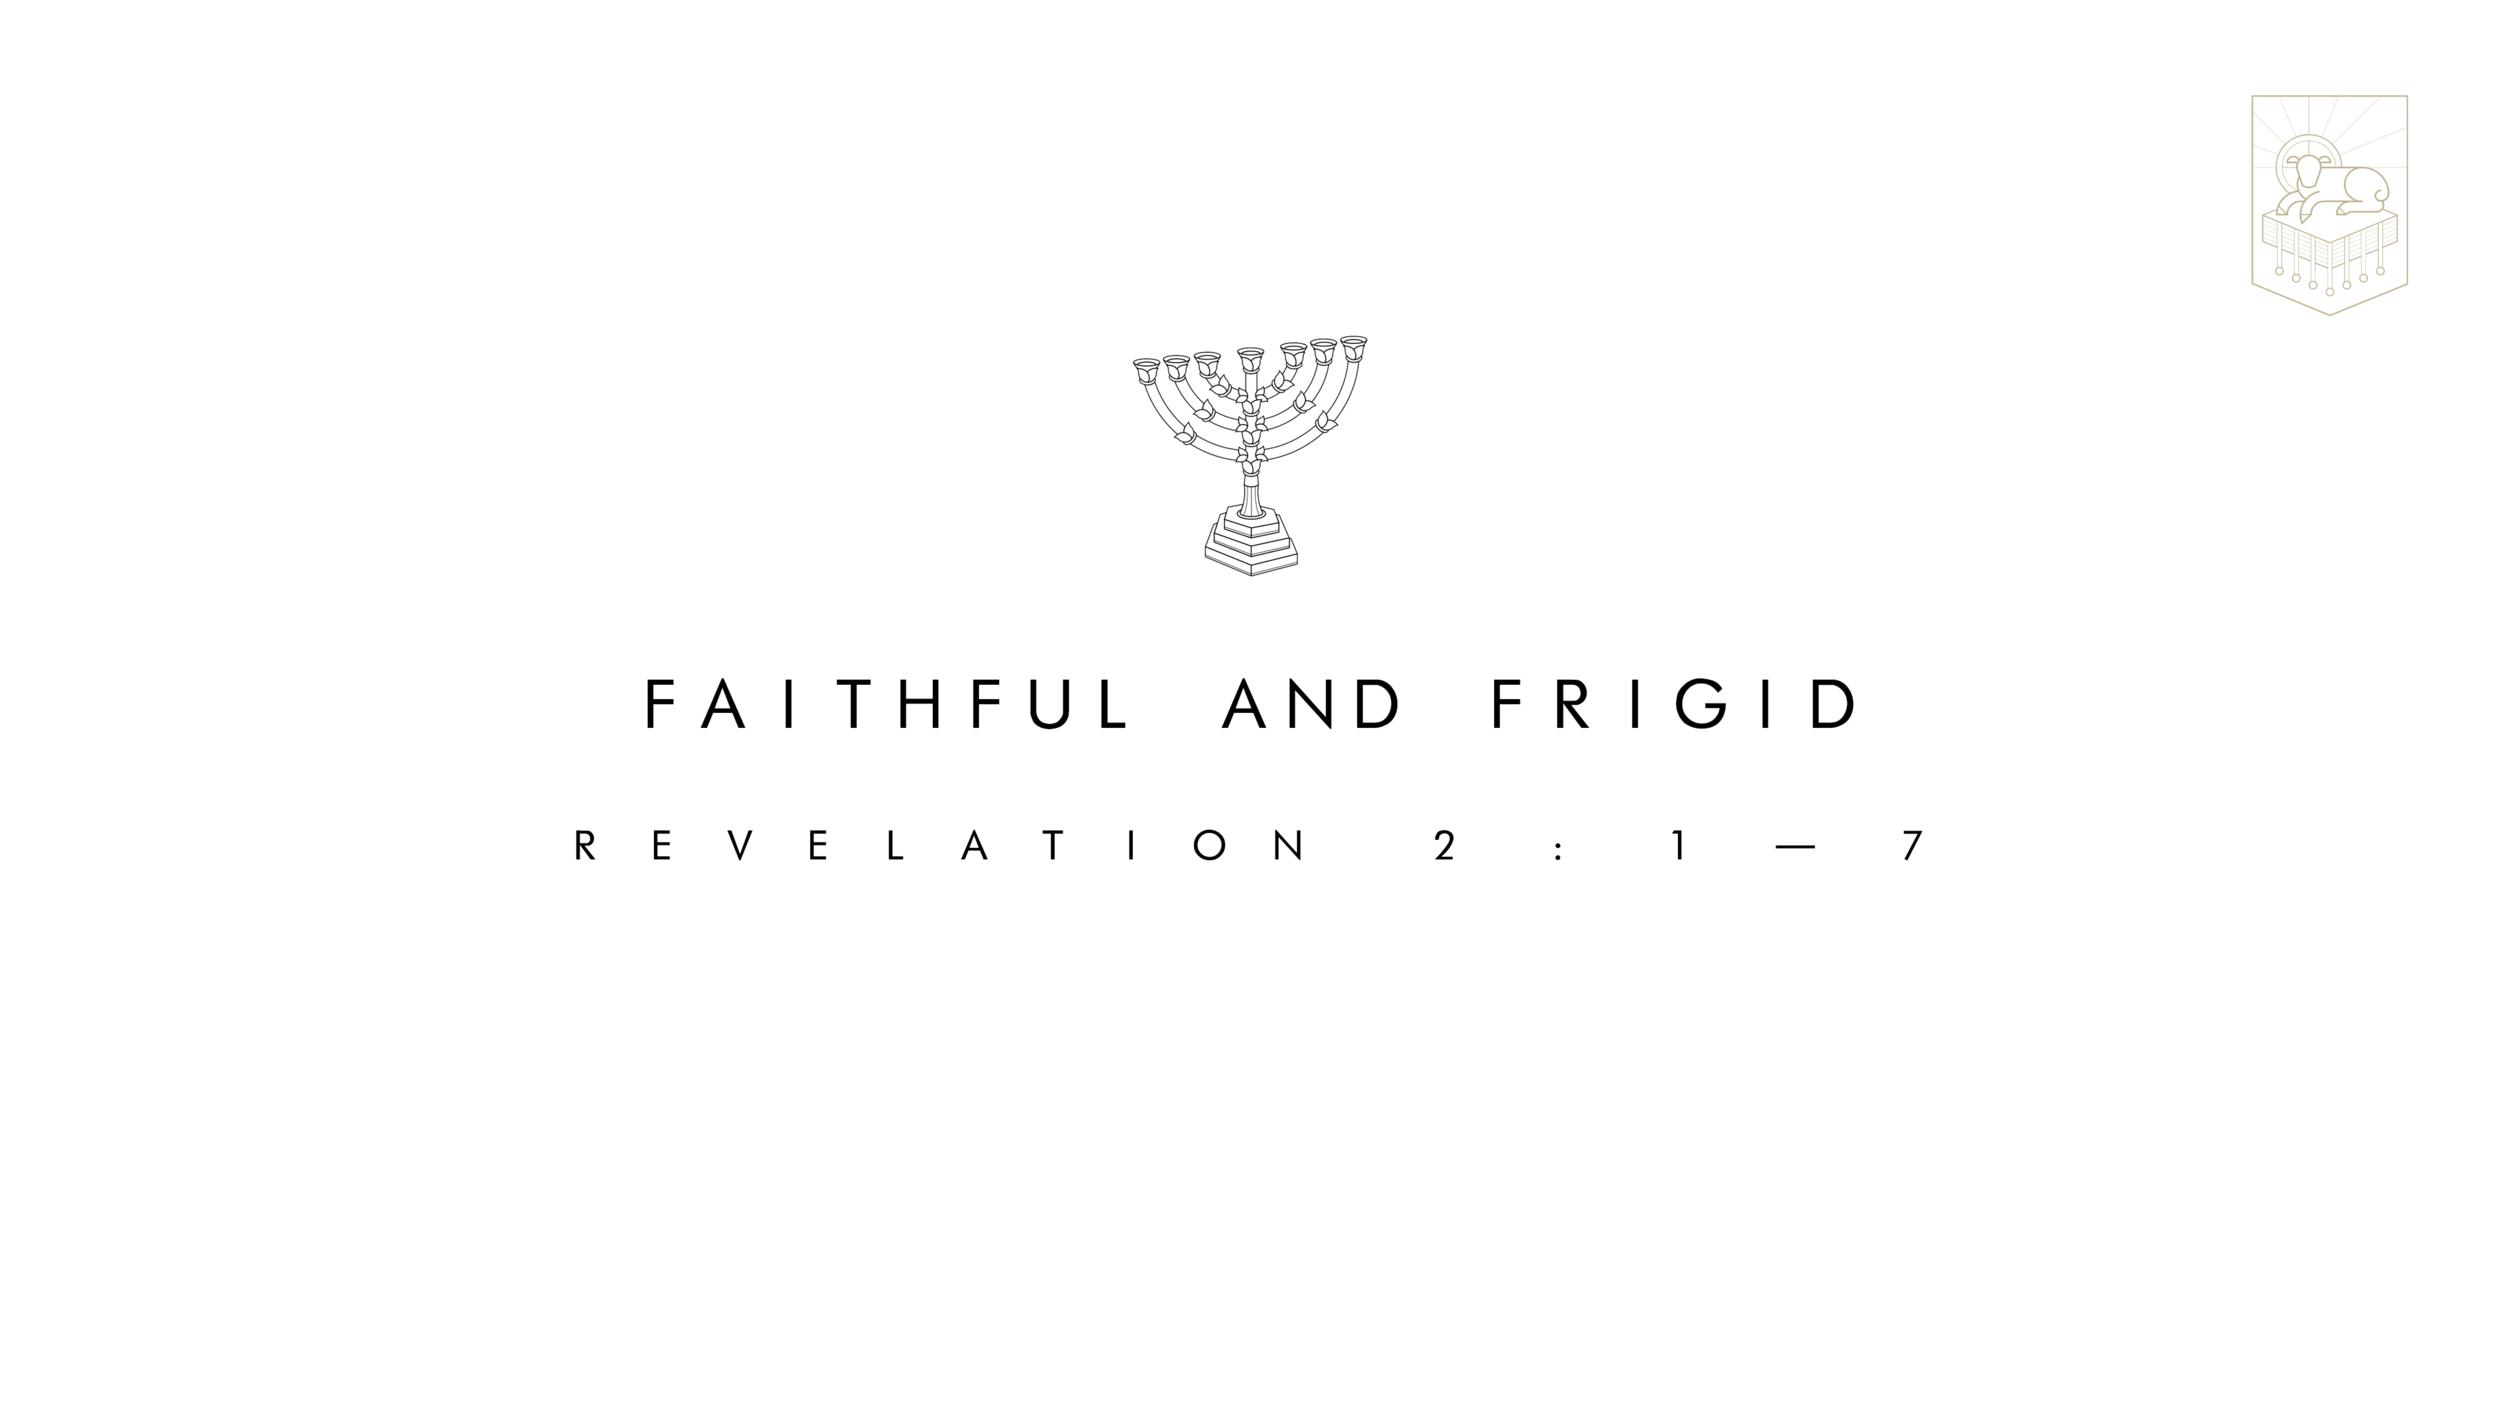 Faithful & Frigid